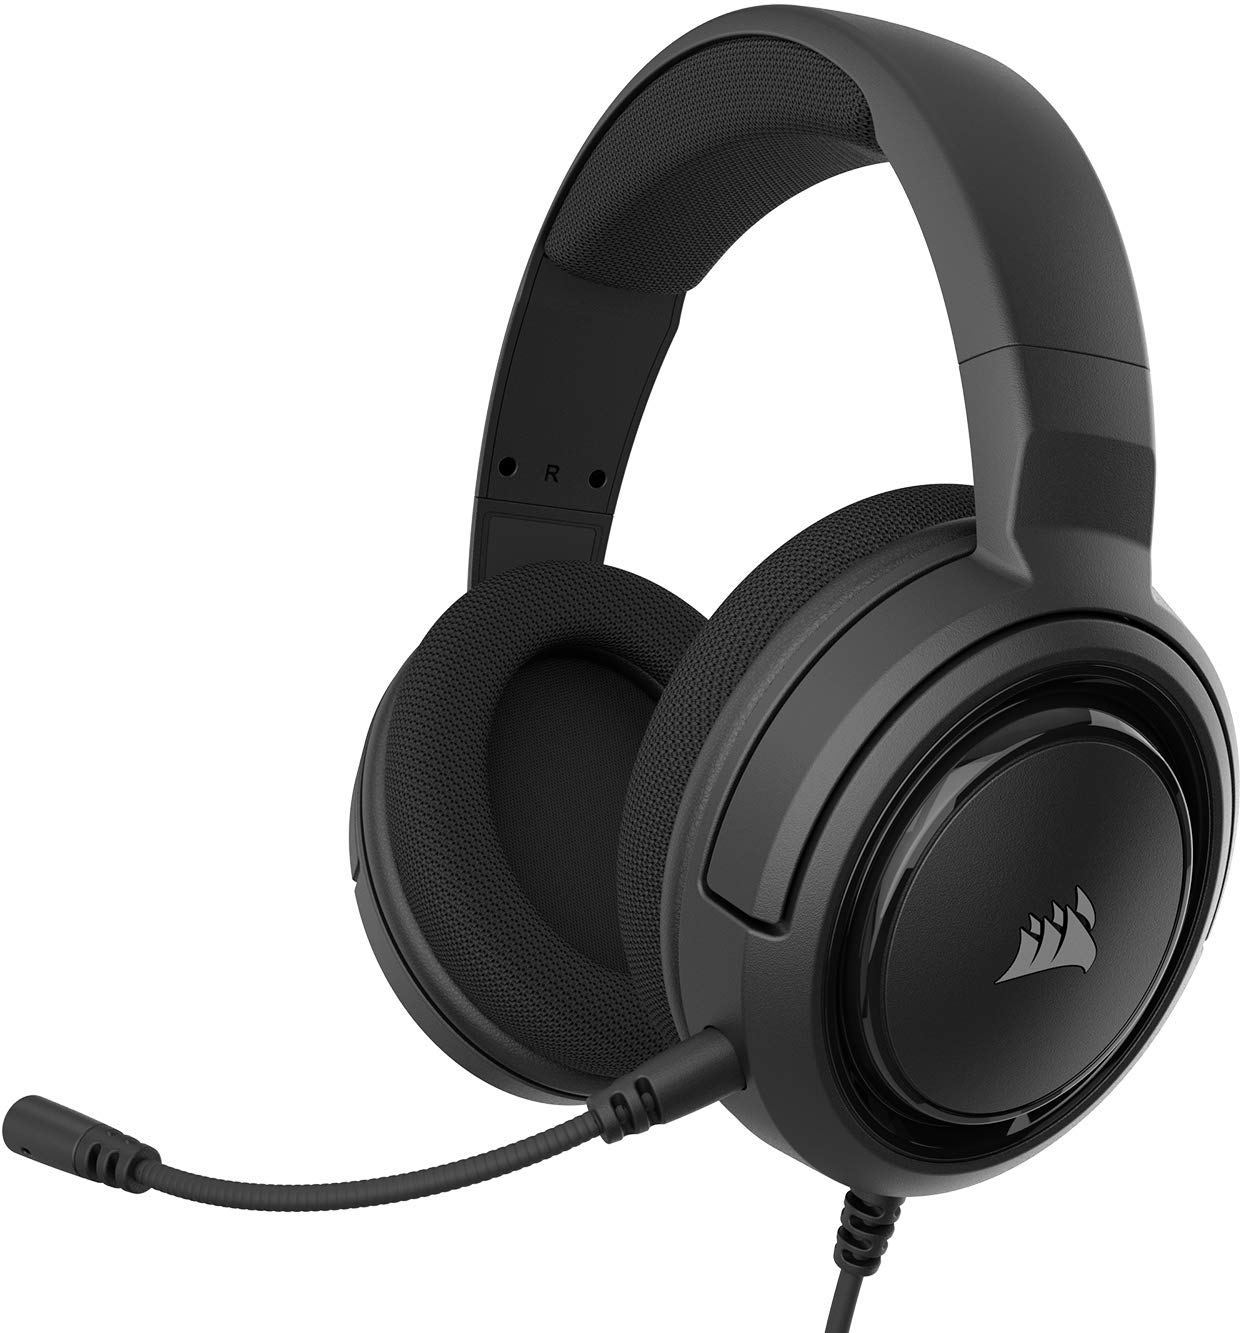 Corsair HS35 Stereo Gaming Headphones